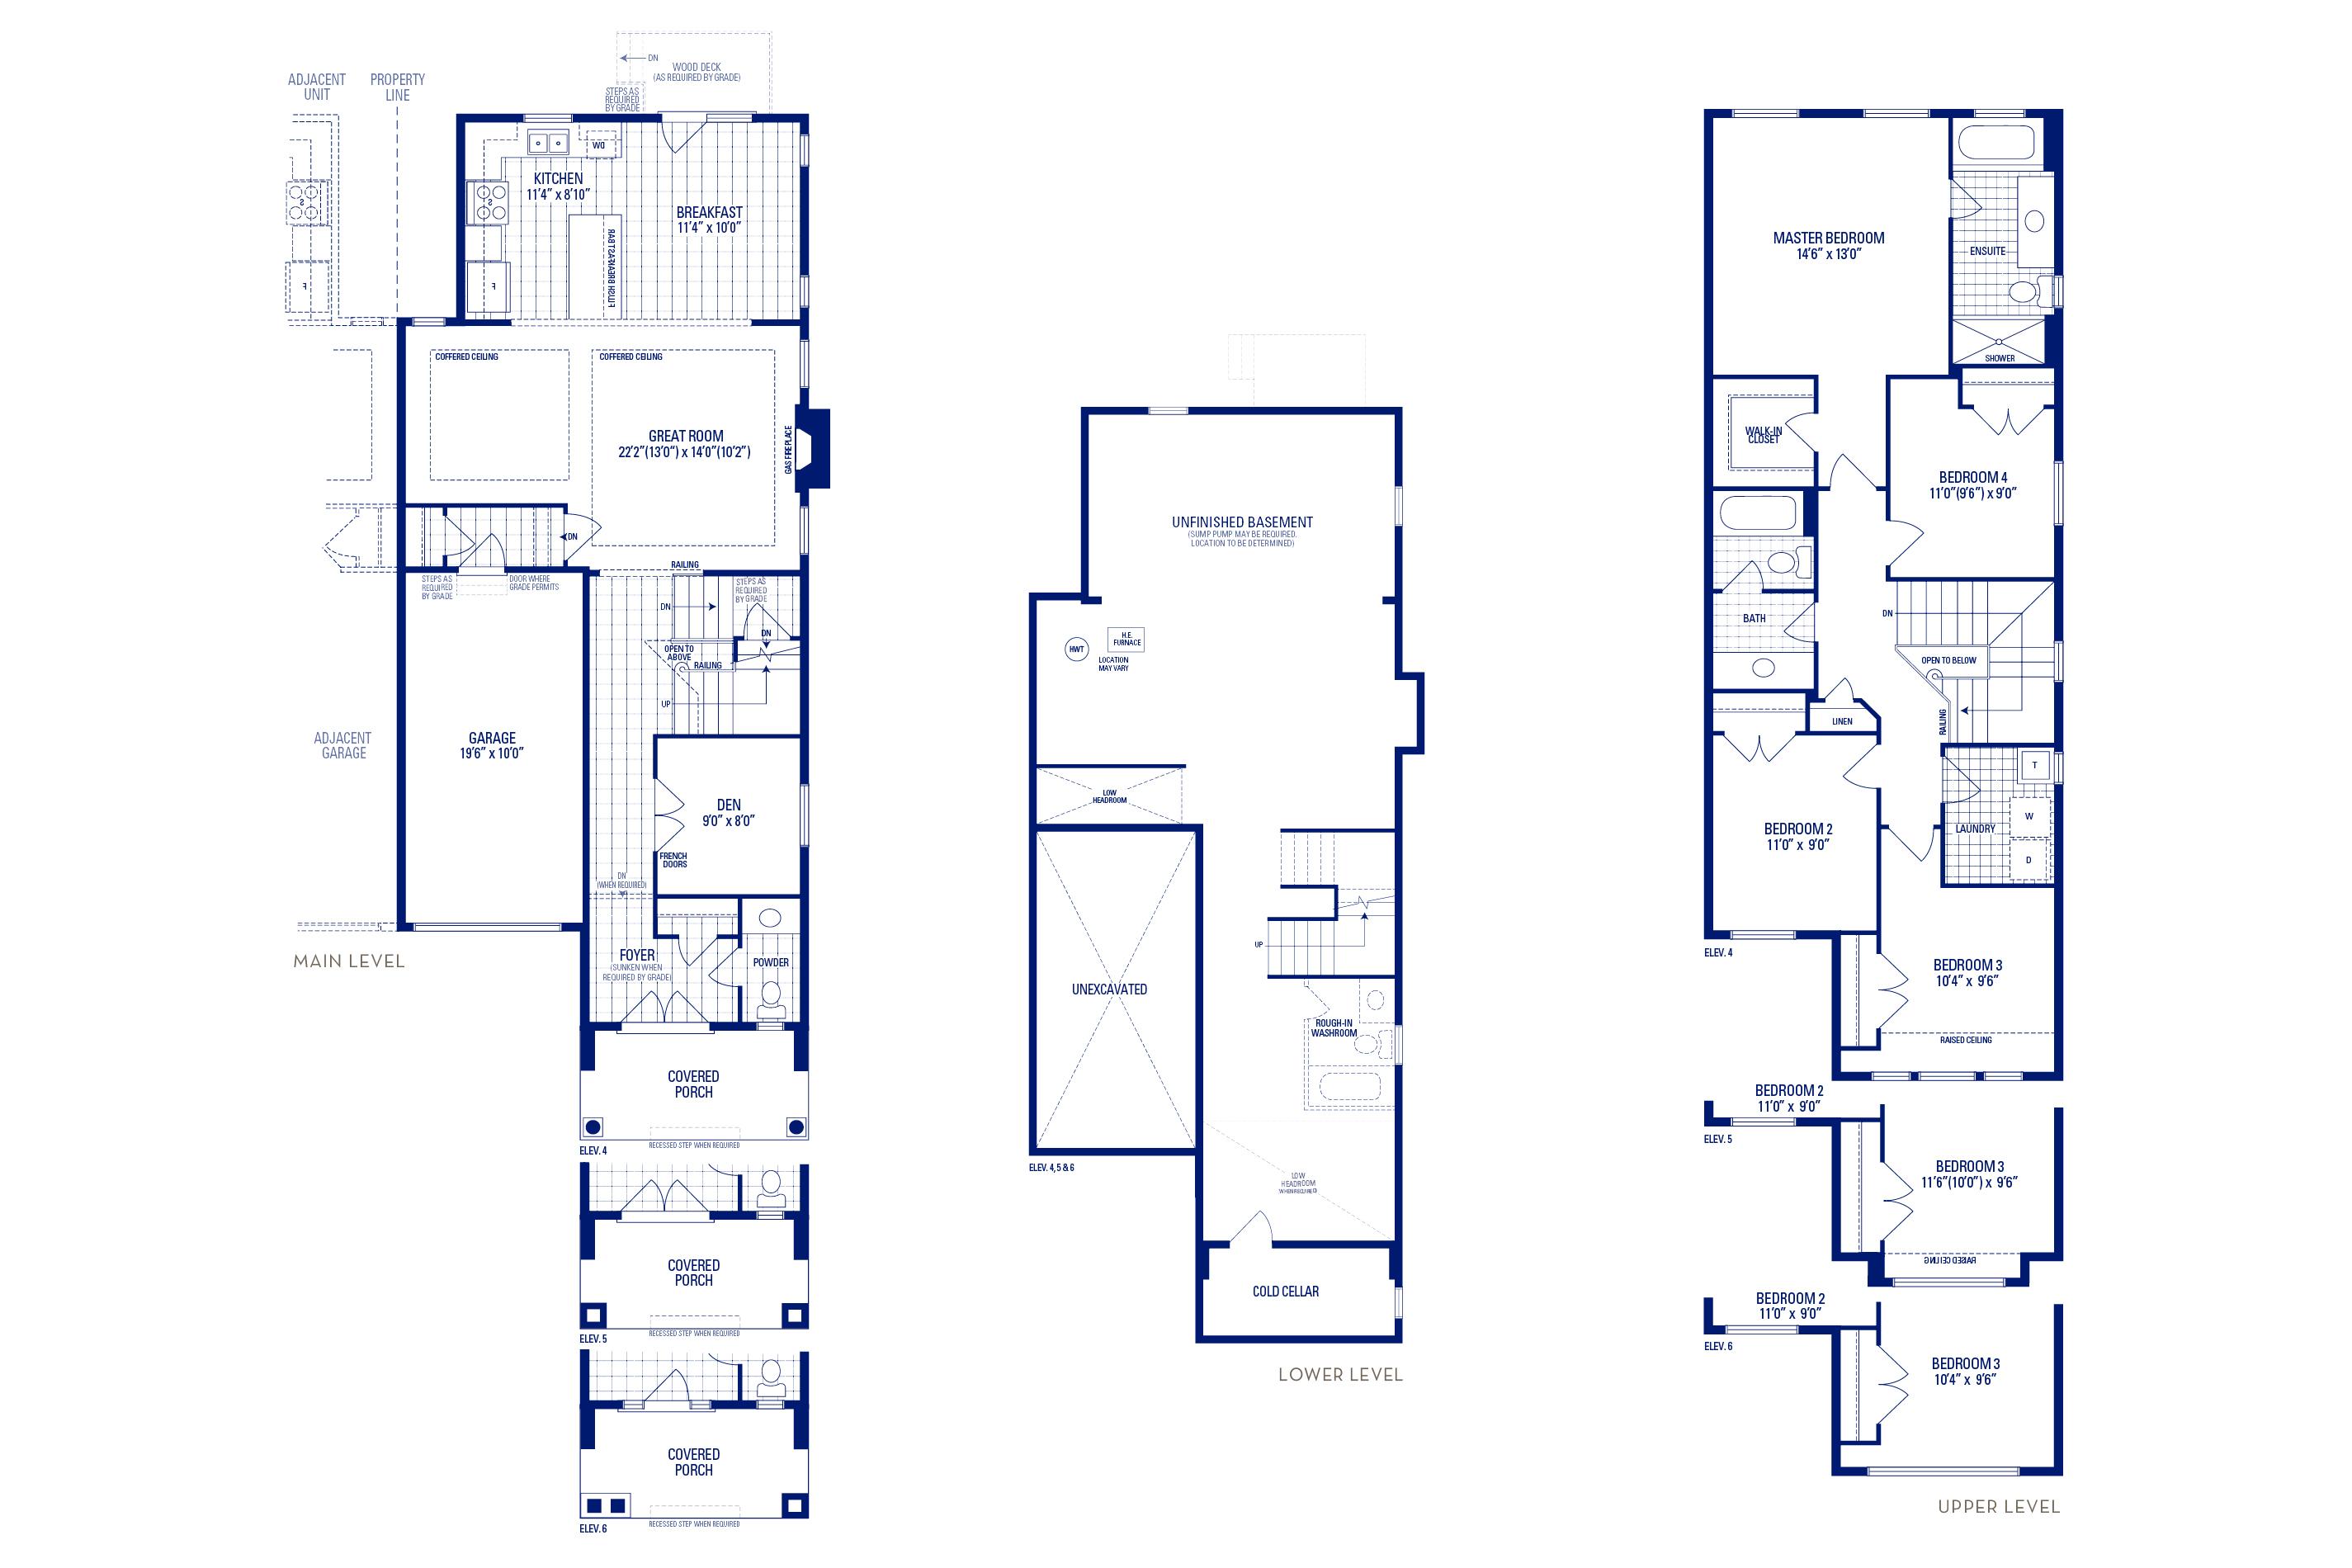 Newberry 2 Elev. 4 Floorplan